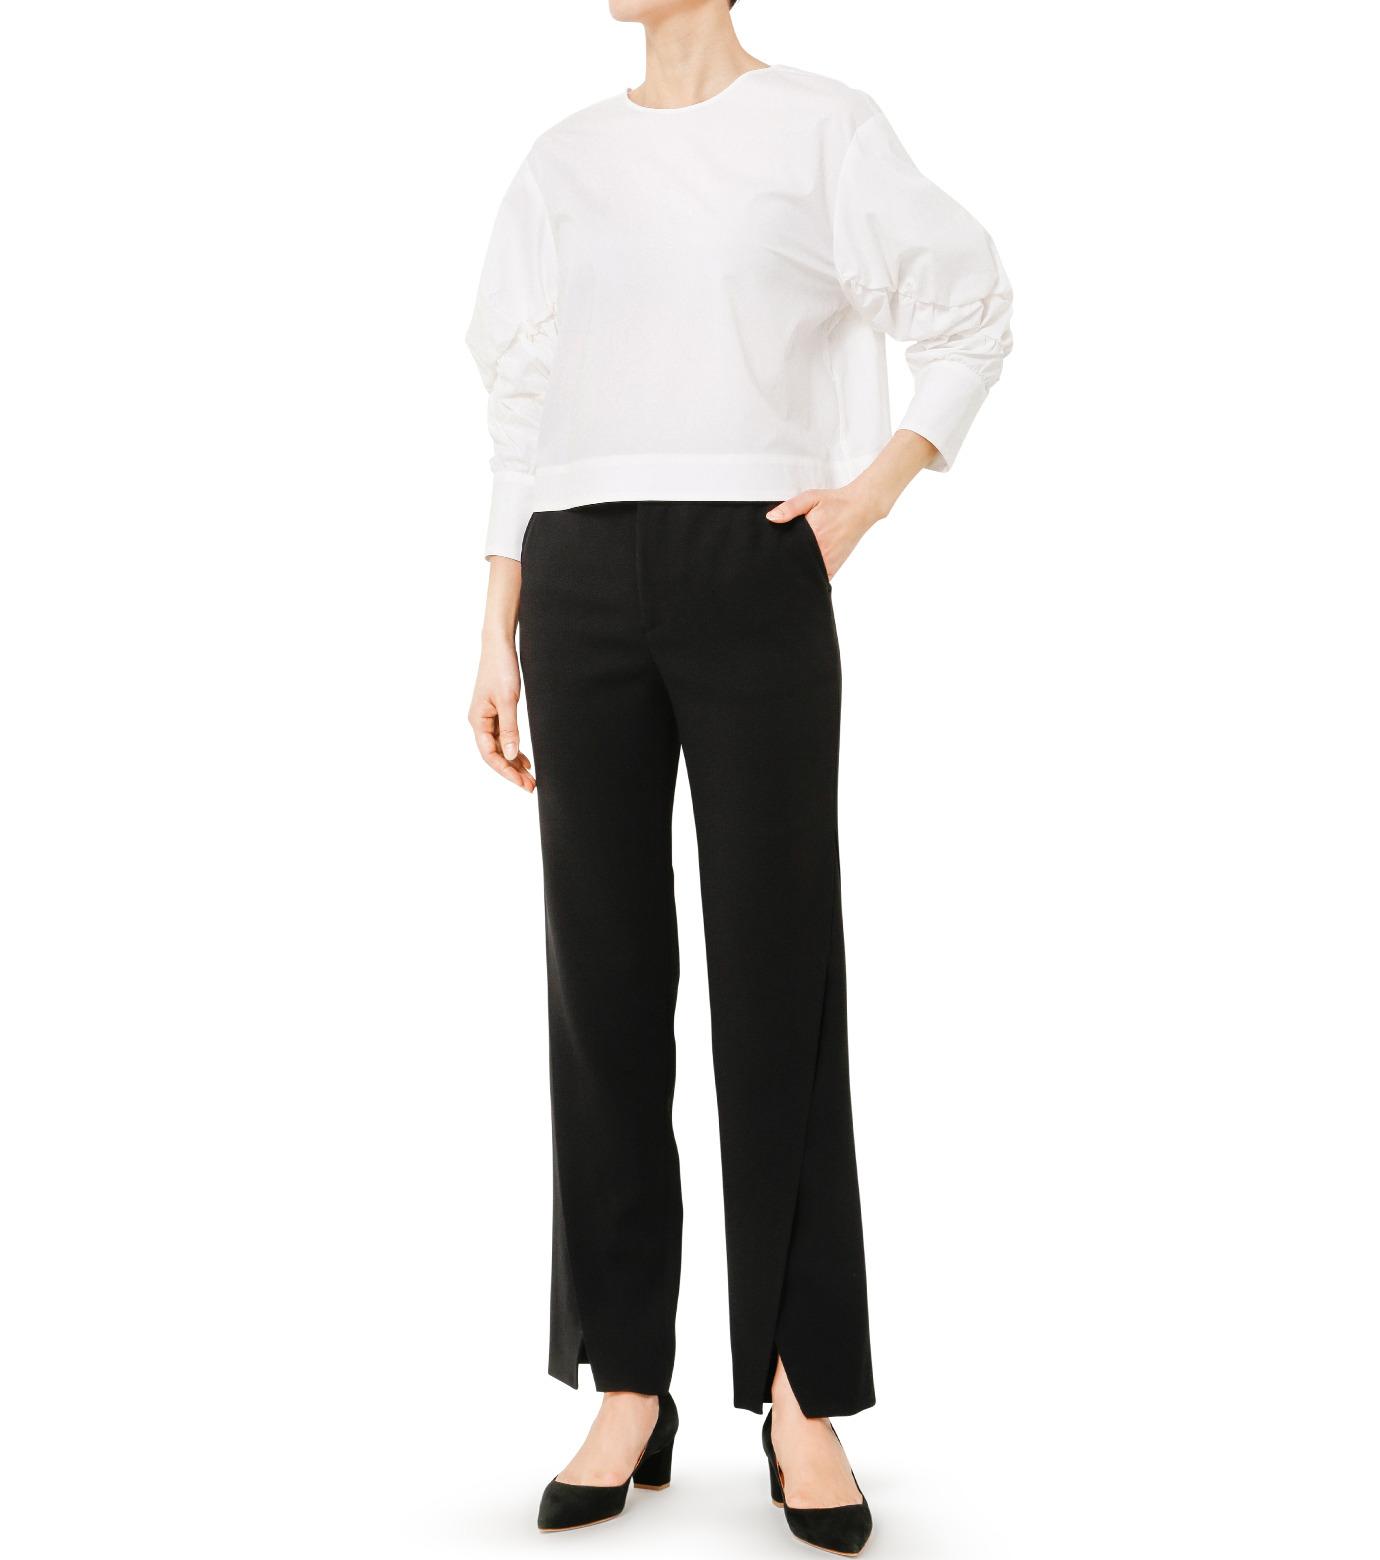 LE CIEL BLEU(ルシェルブルー)のタイプライターシュリンクスリーブトップス-WHITE(シャツ/shirt)-19S63104 拡大詳細画像2